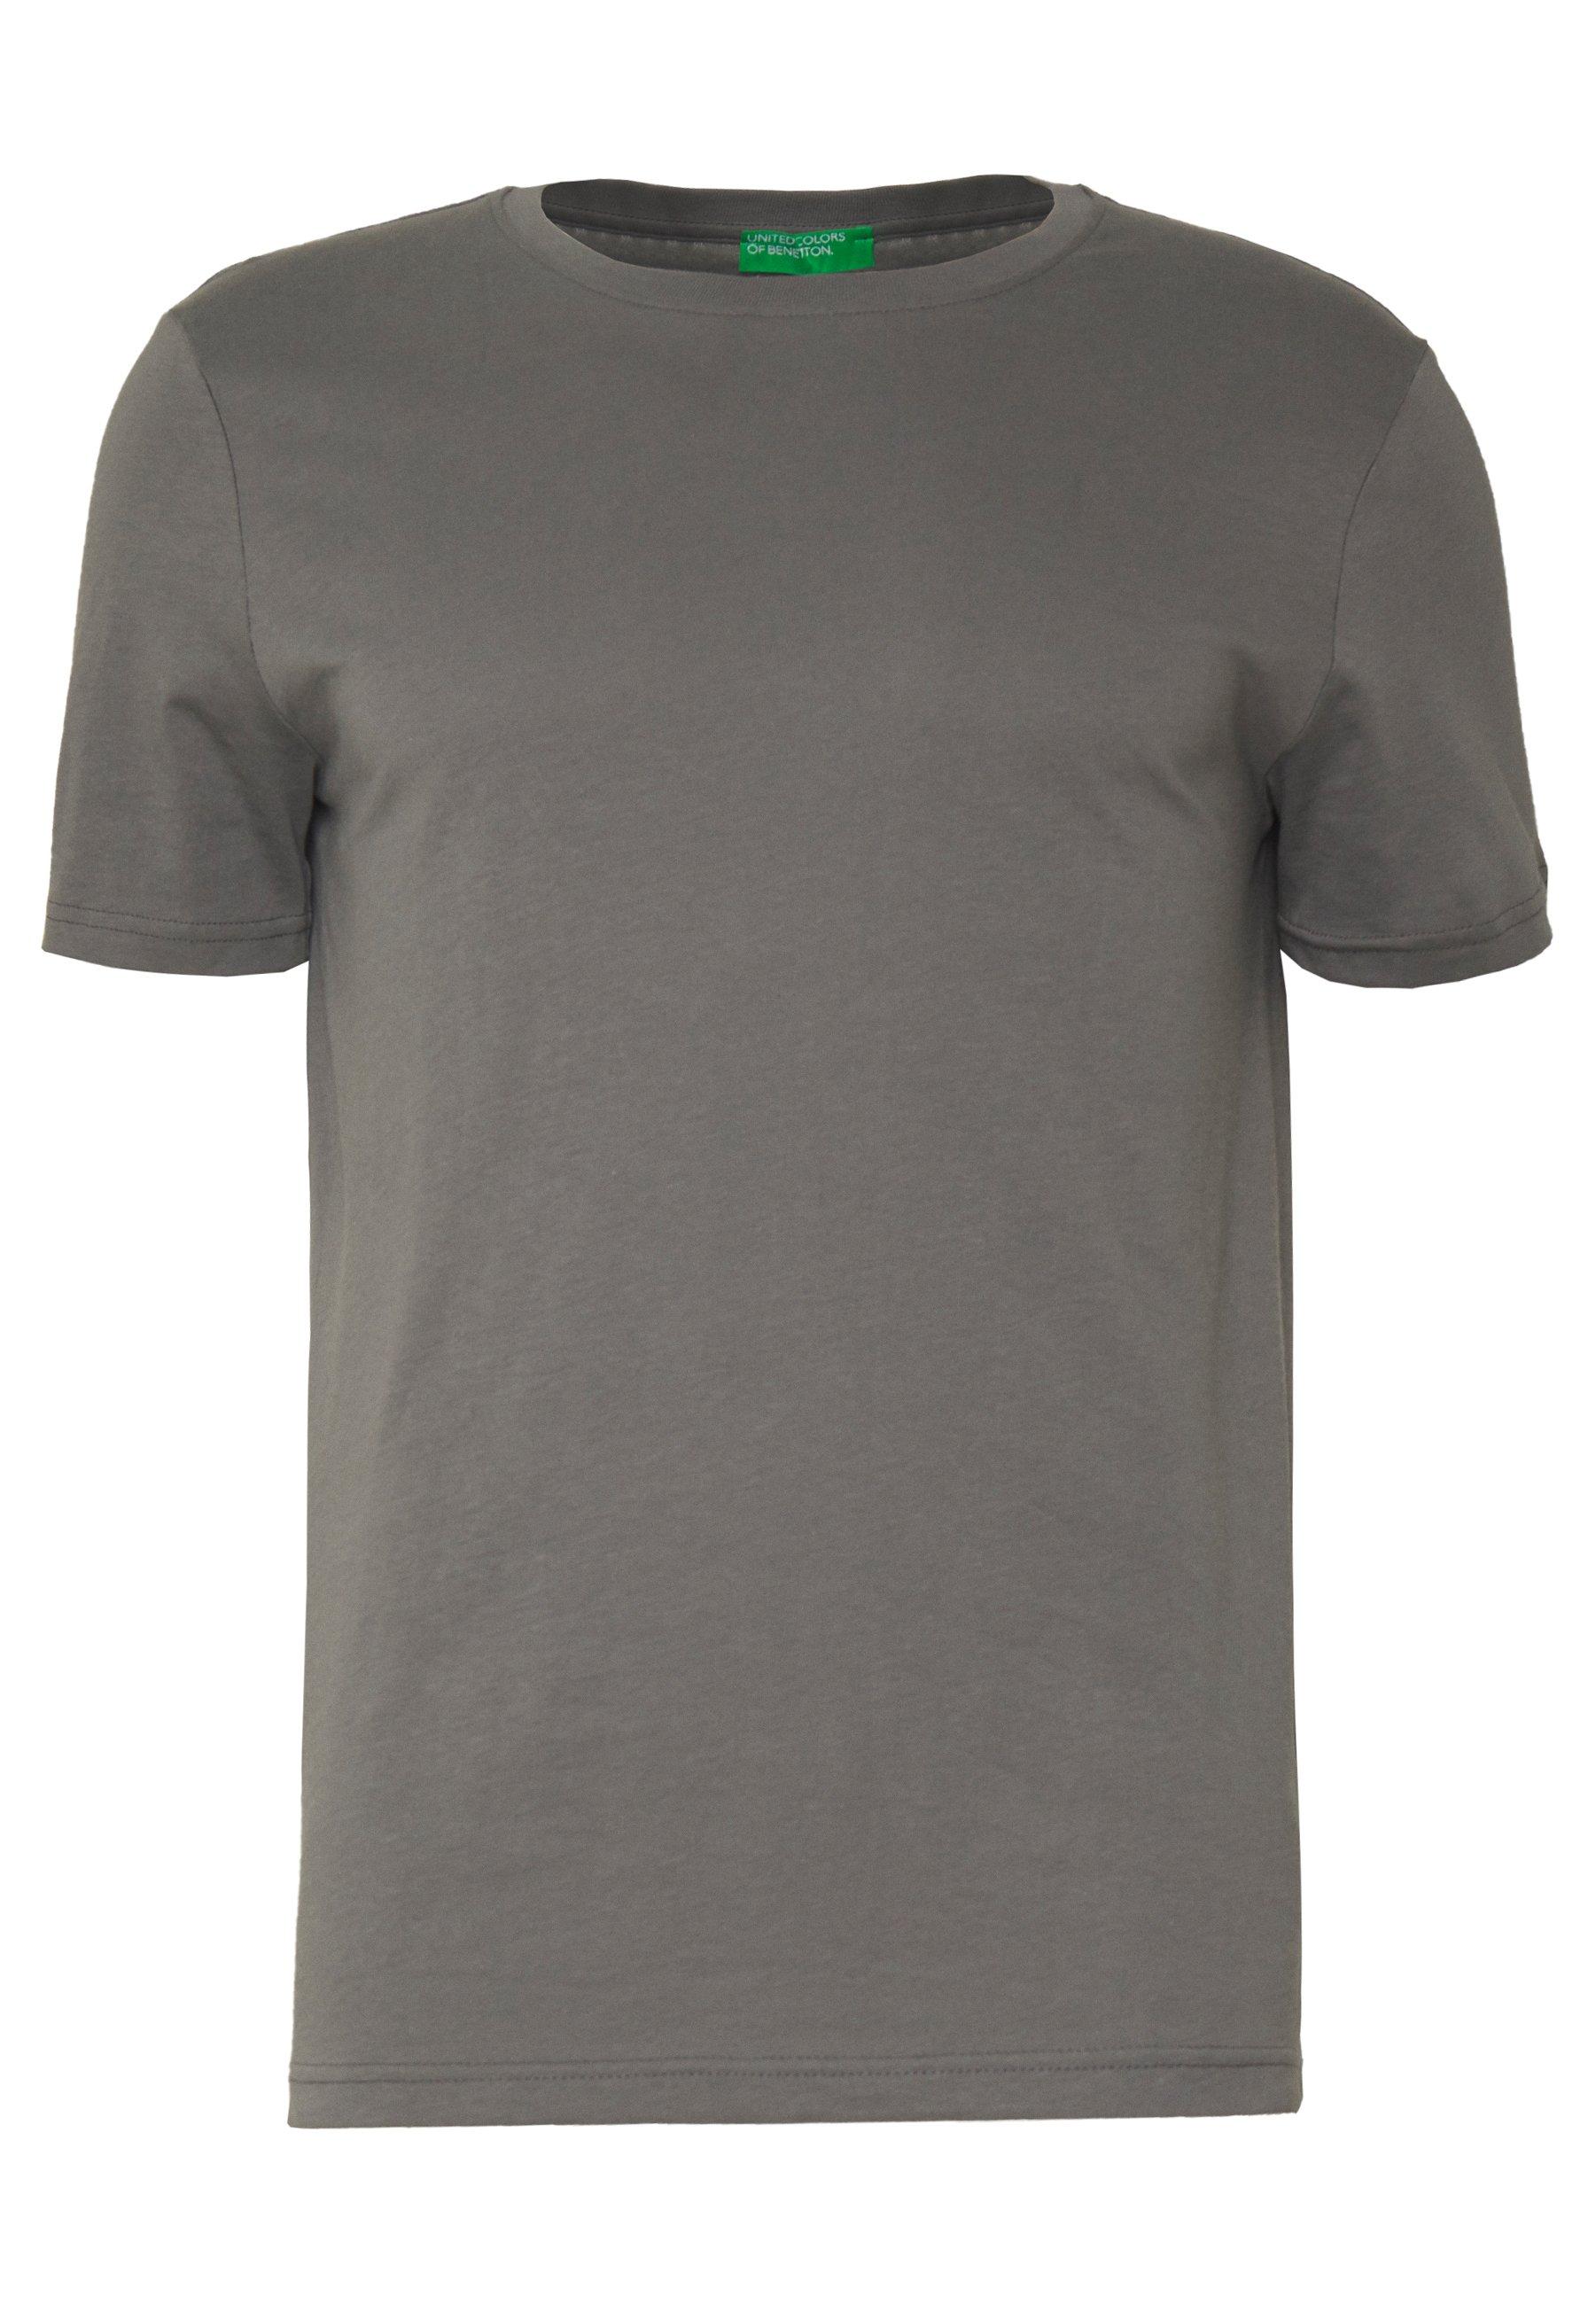 Benetton T-shirt Basique - Anthracite